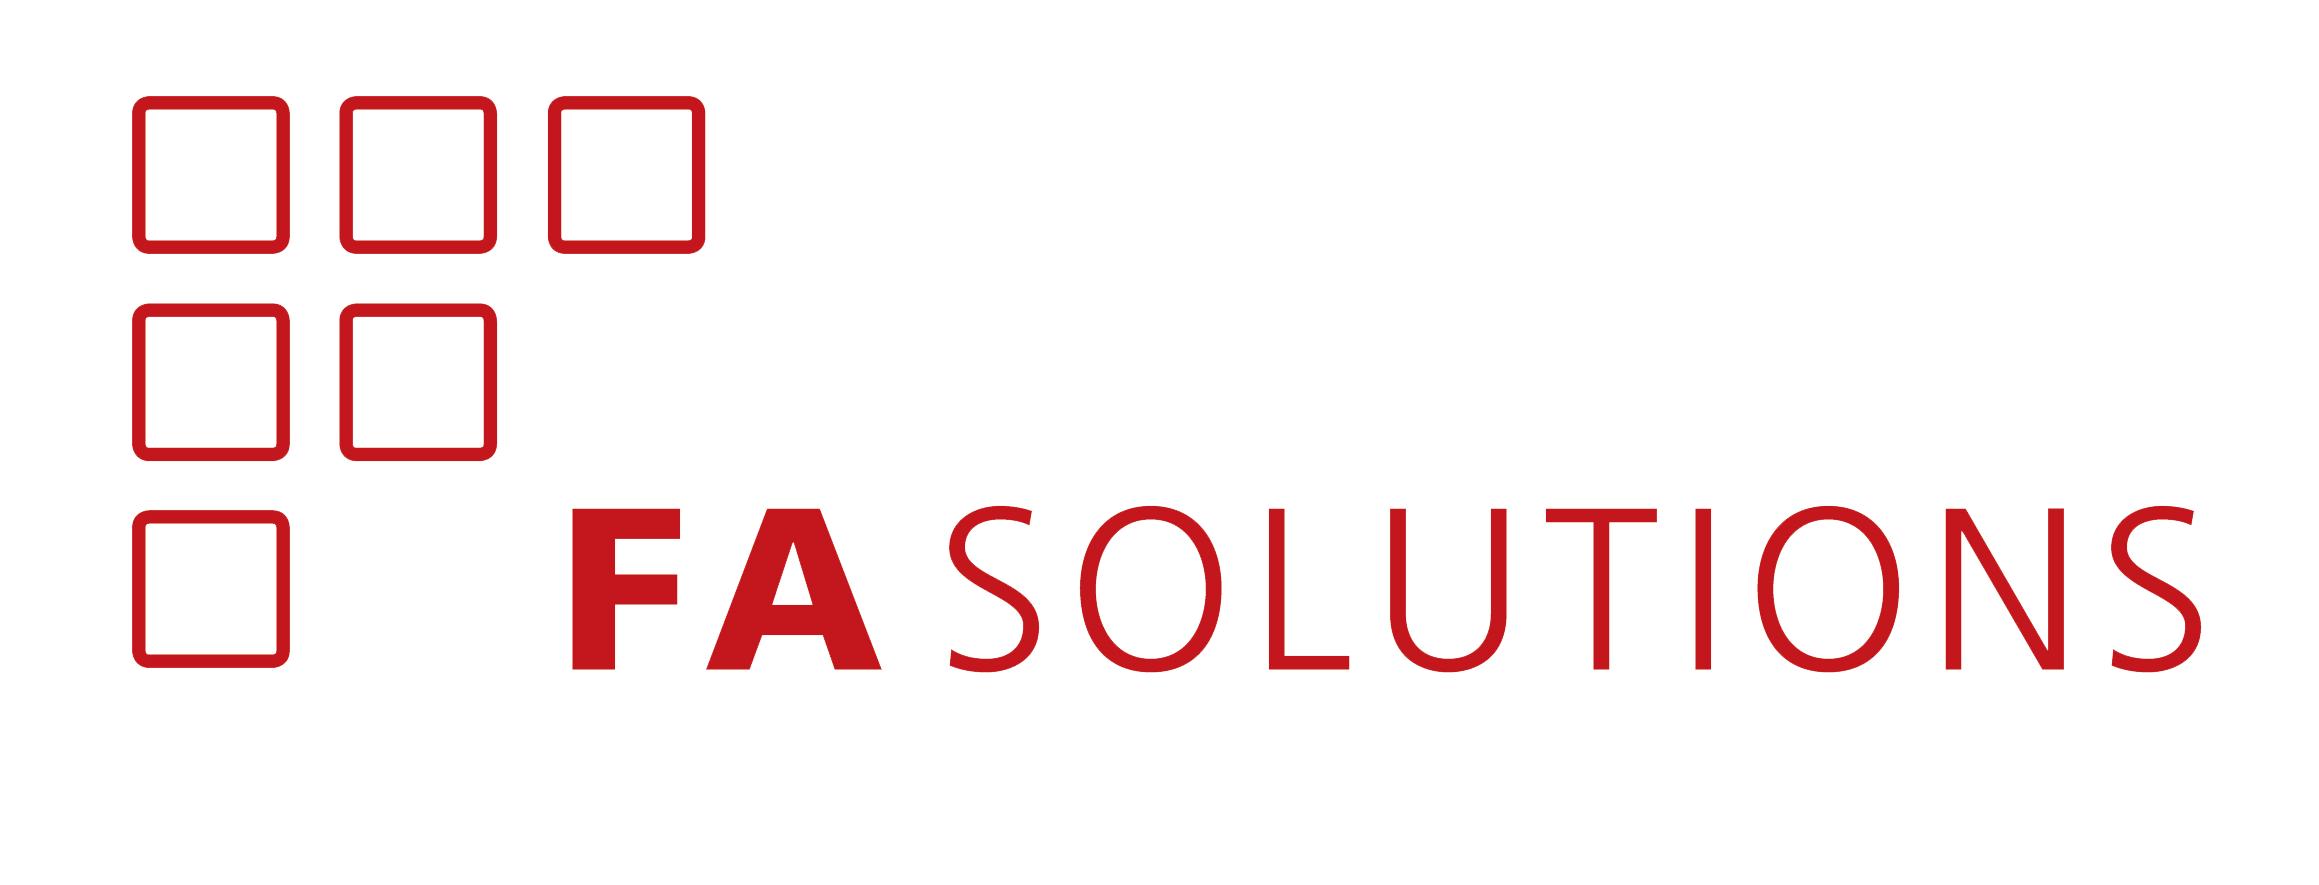 fasolutions-logo